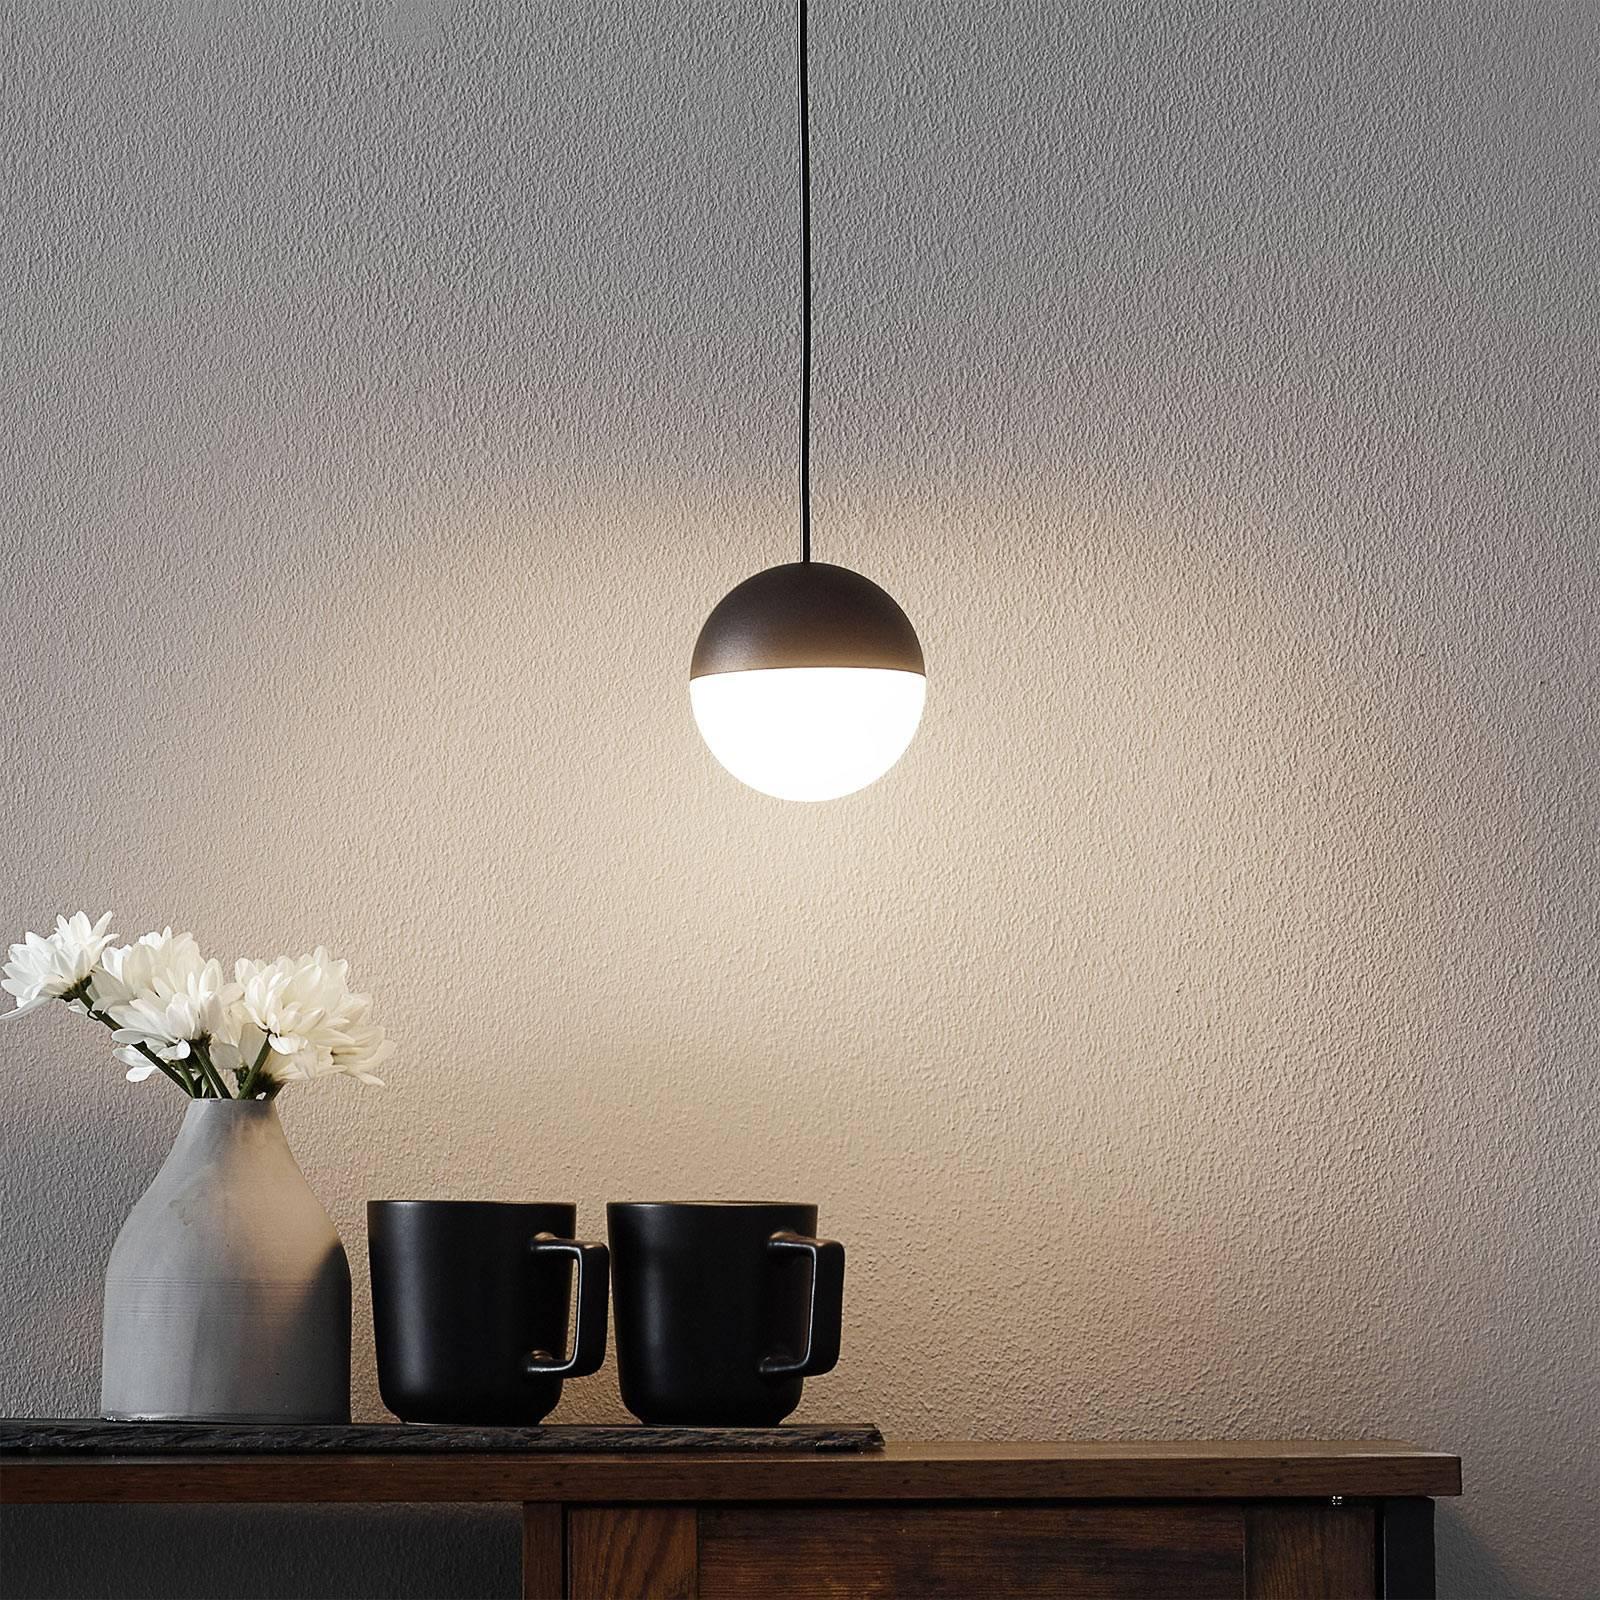 LED hanglamp Custo, 1-lamp